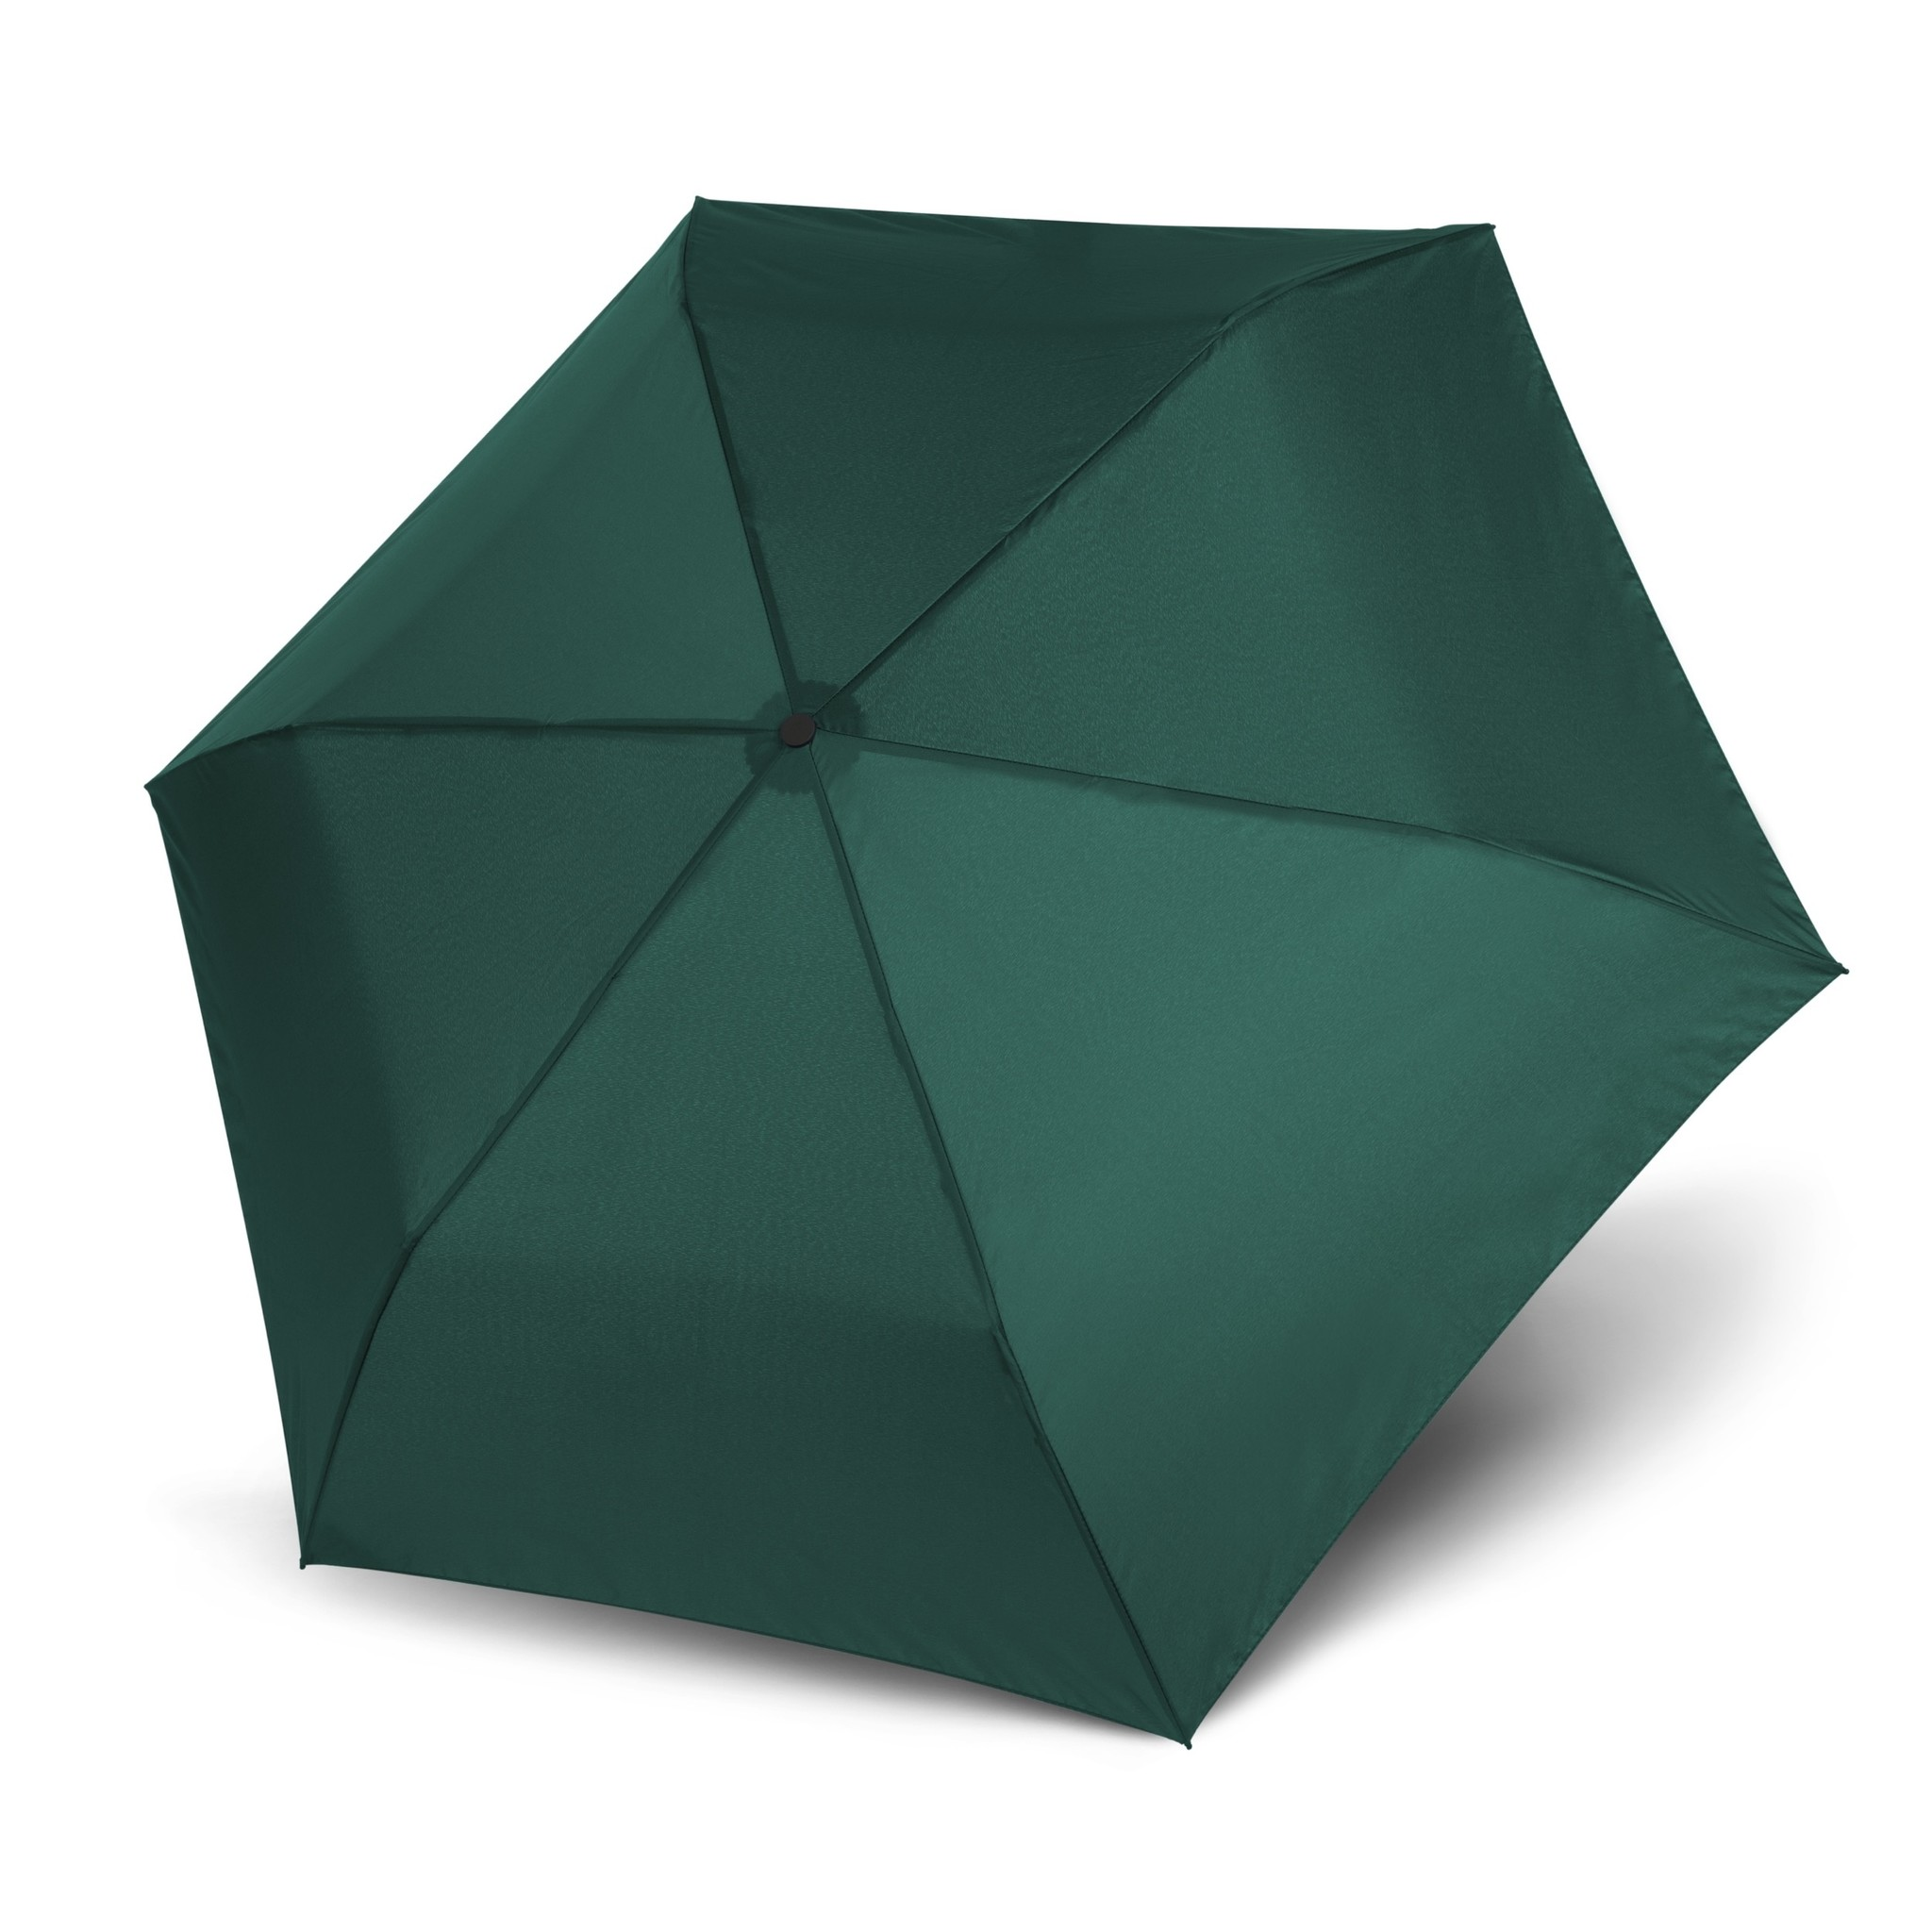 Doppler Doppler Zero 99 zeer lichte compacte Stormparaplu - Evergreen